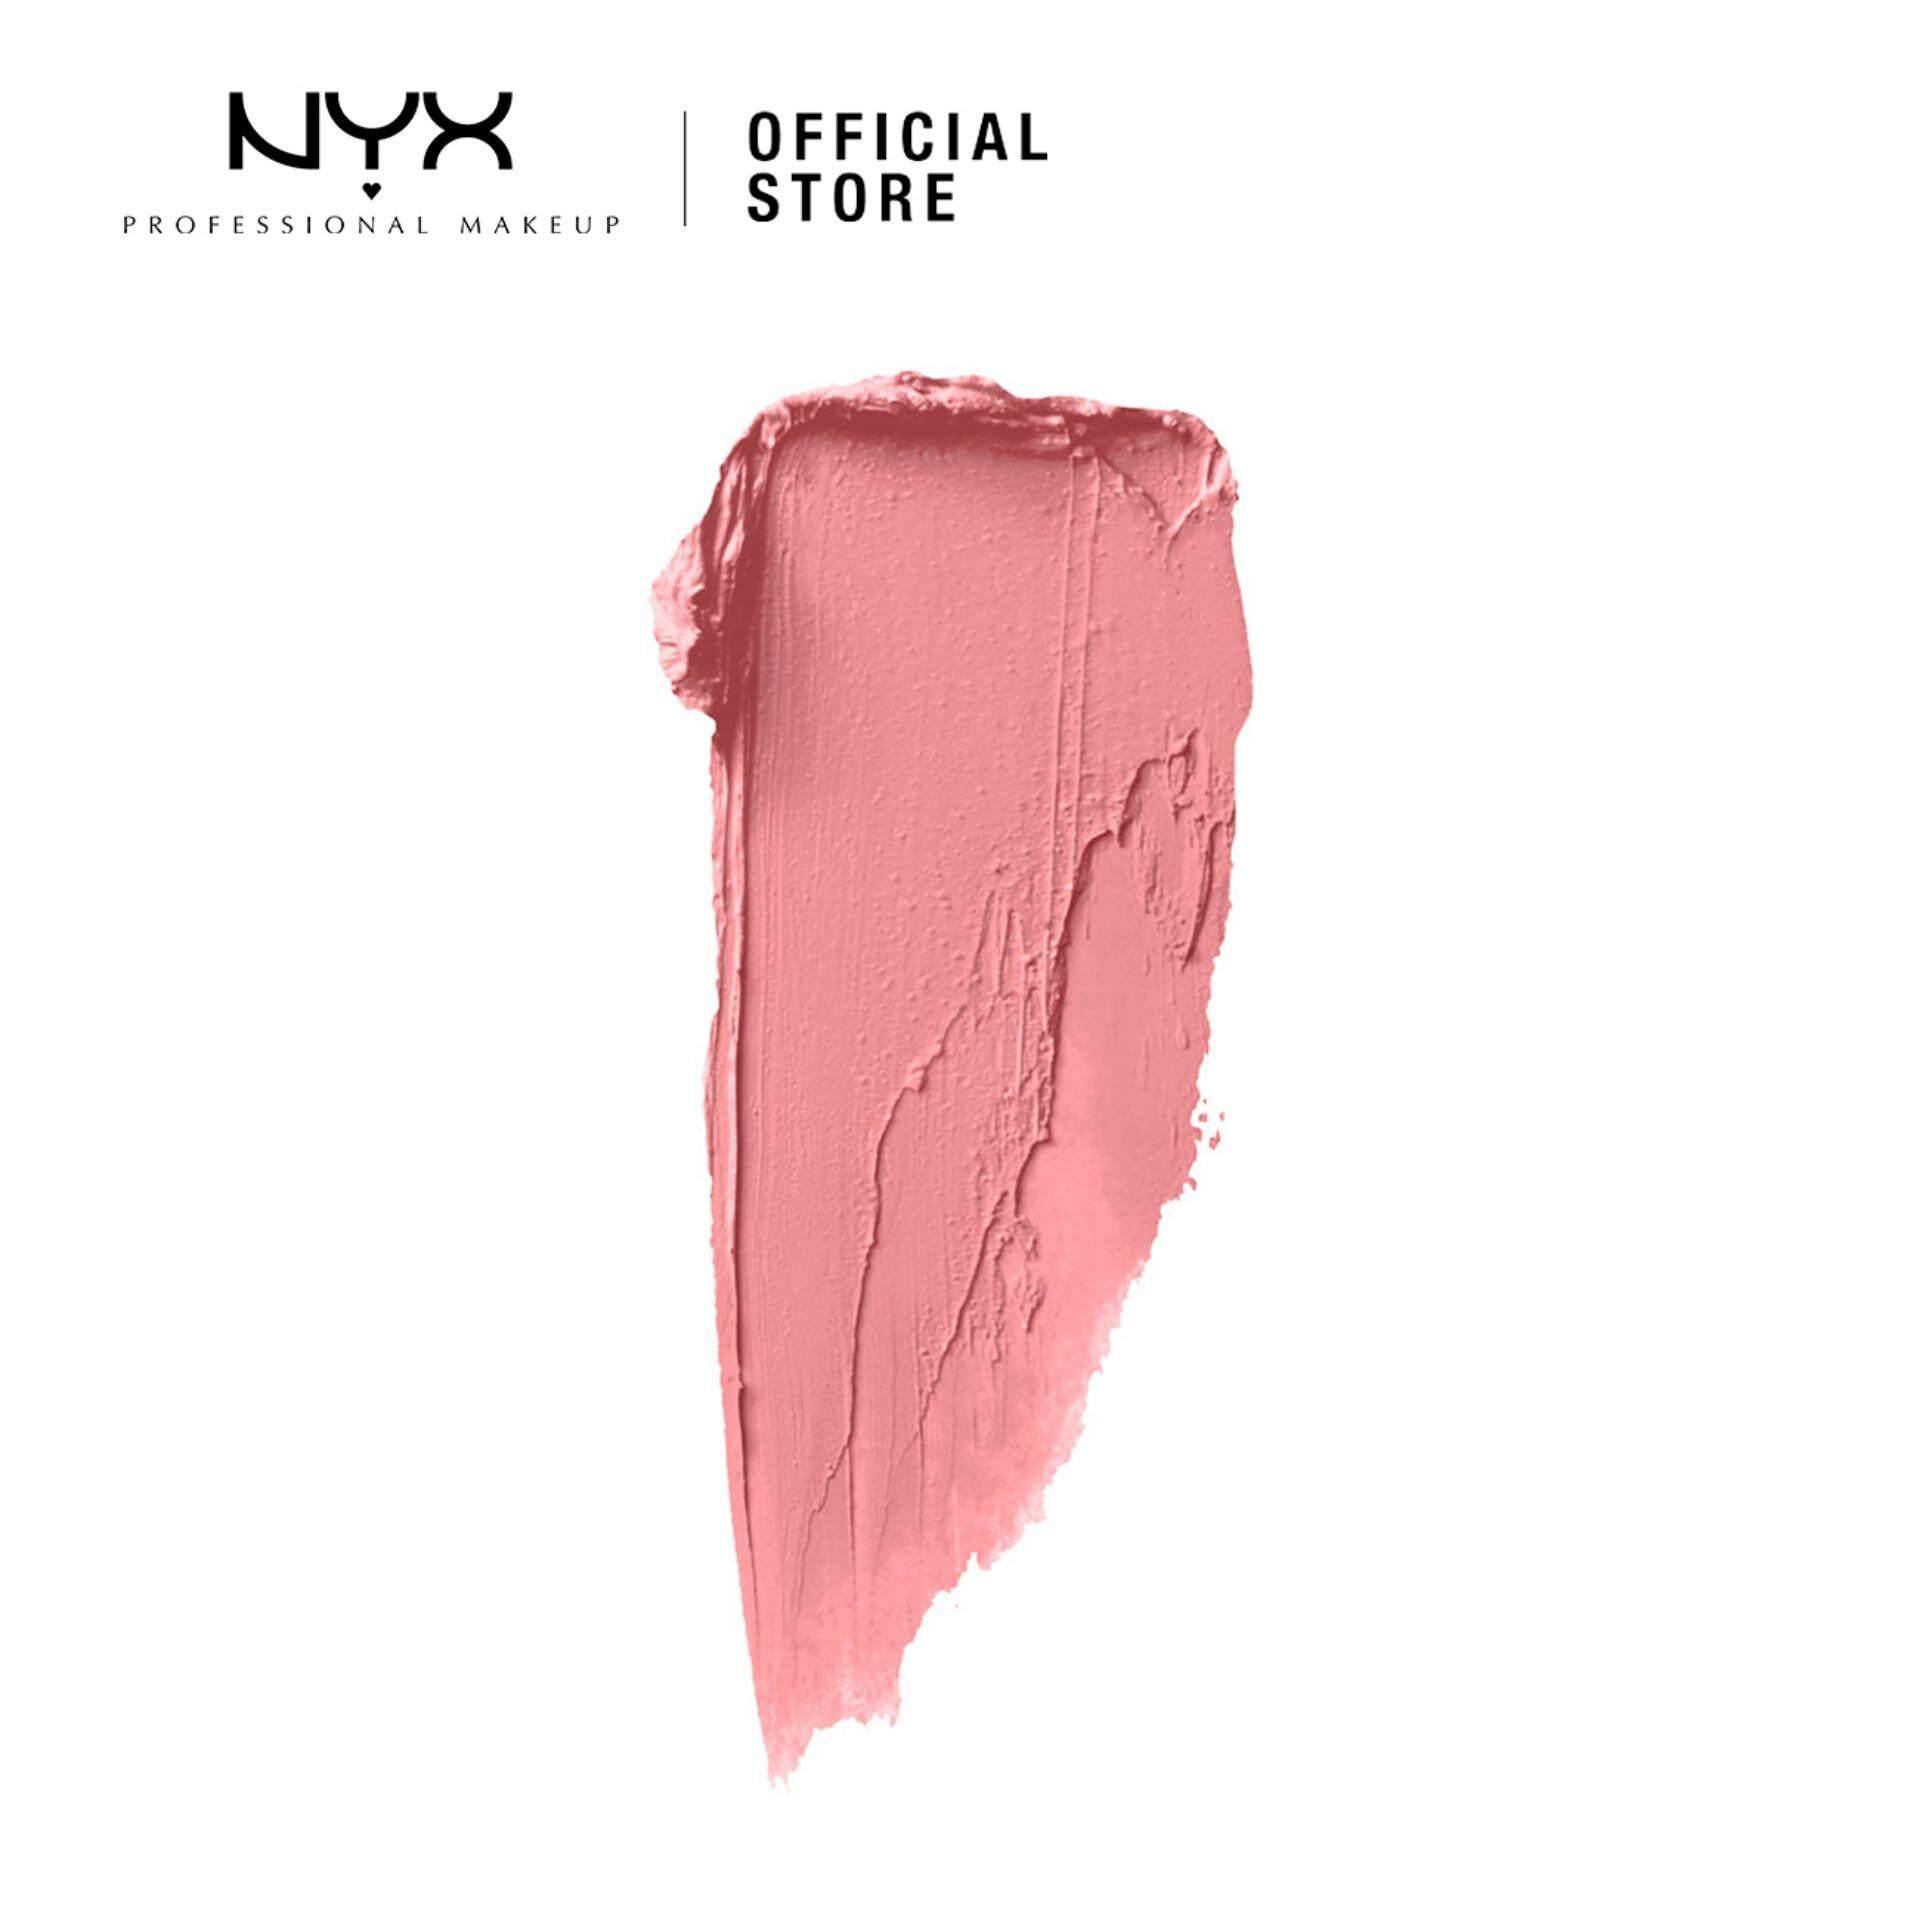 Fitur Nyx Professional Makeup Soft Matte Lip Cream 17 Ibiza Lipstik Lipcream Detail Gambar Lipstick Terbaru